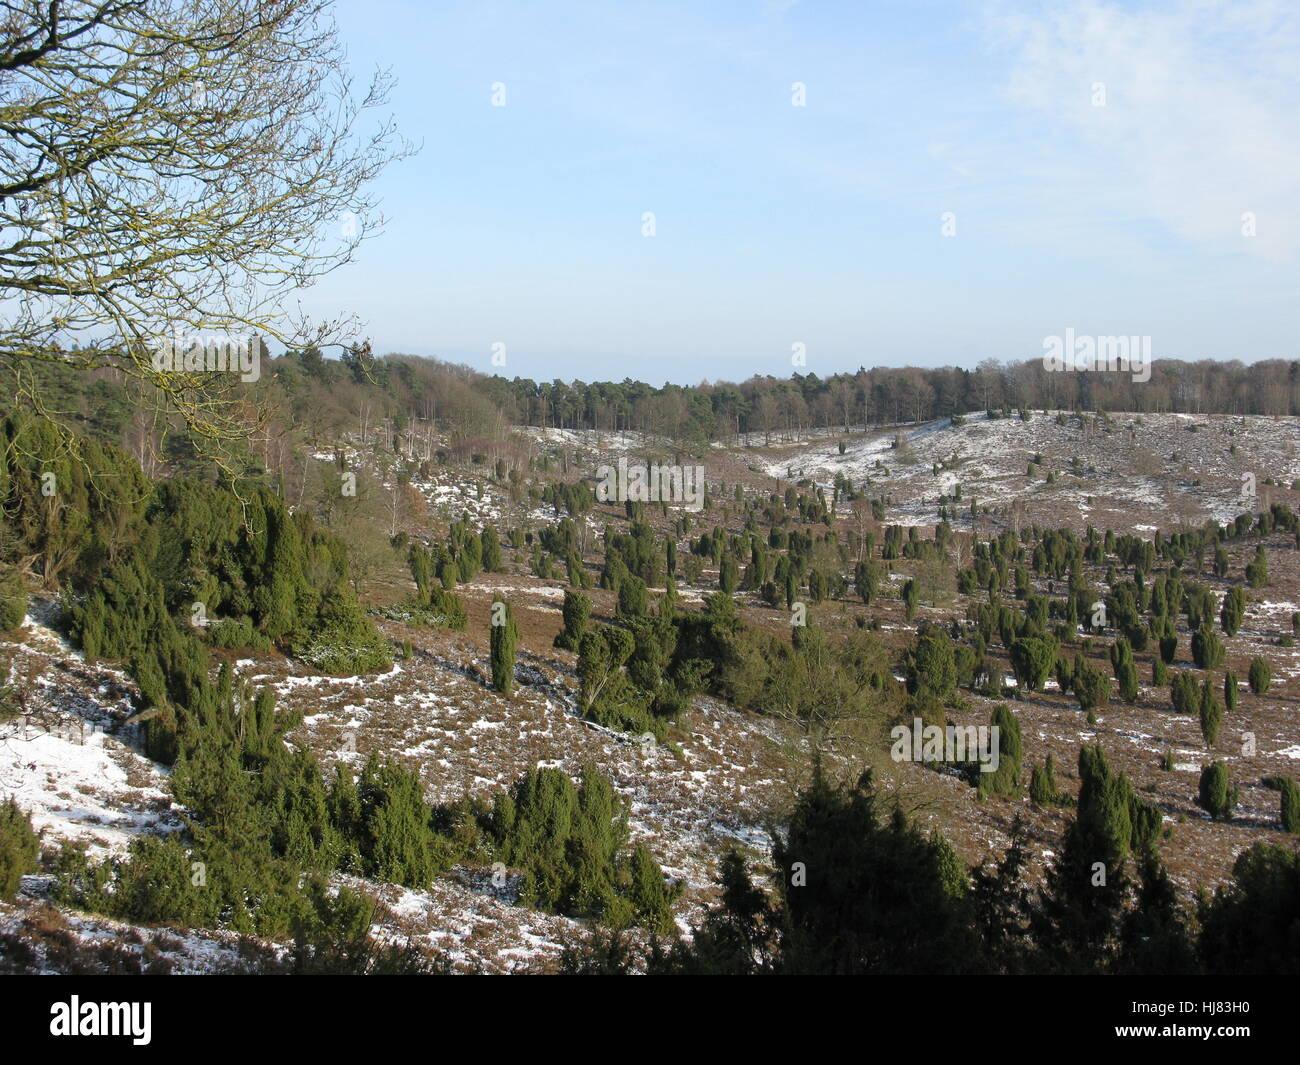 lneburg heath in winter Stock Photo